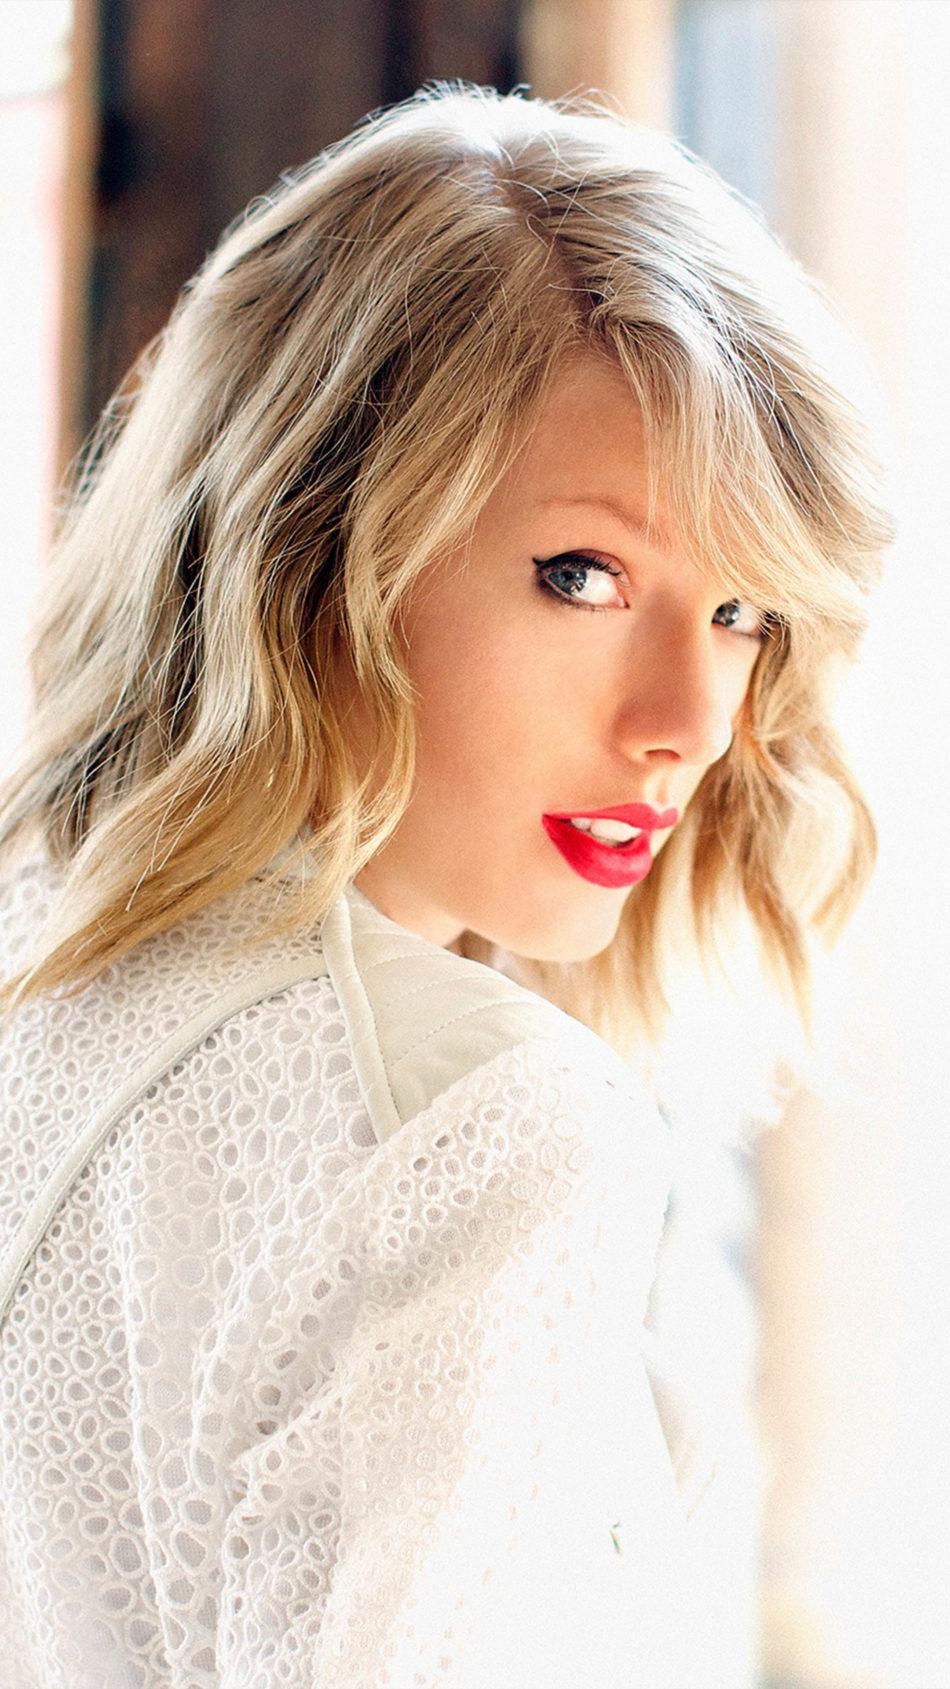 Singer Taylor Swift White Dress Blonde 4K Ultra HD Mobile Wallpaper